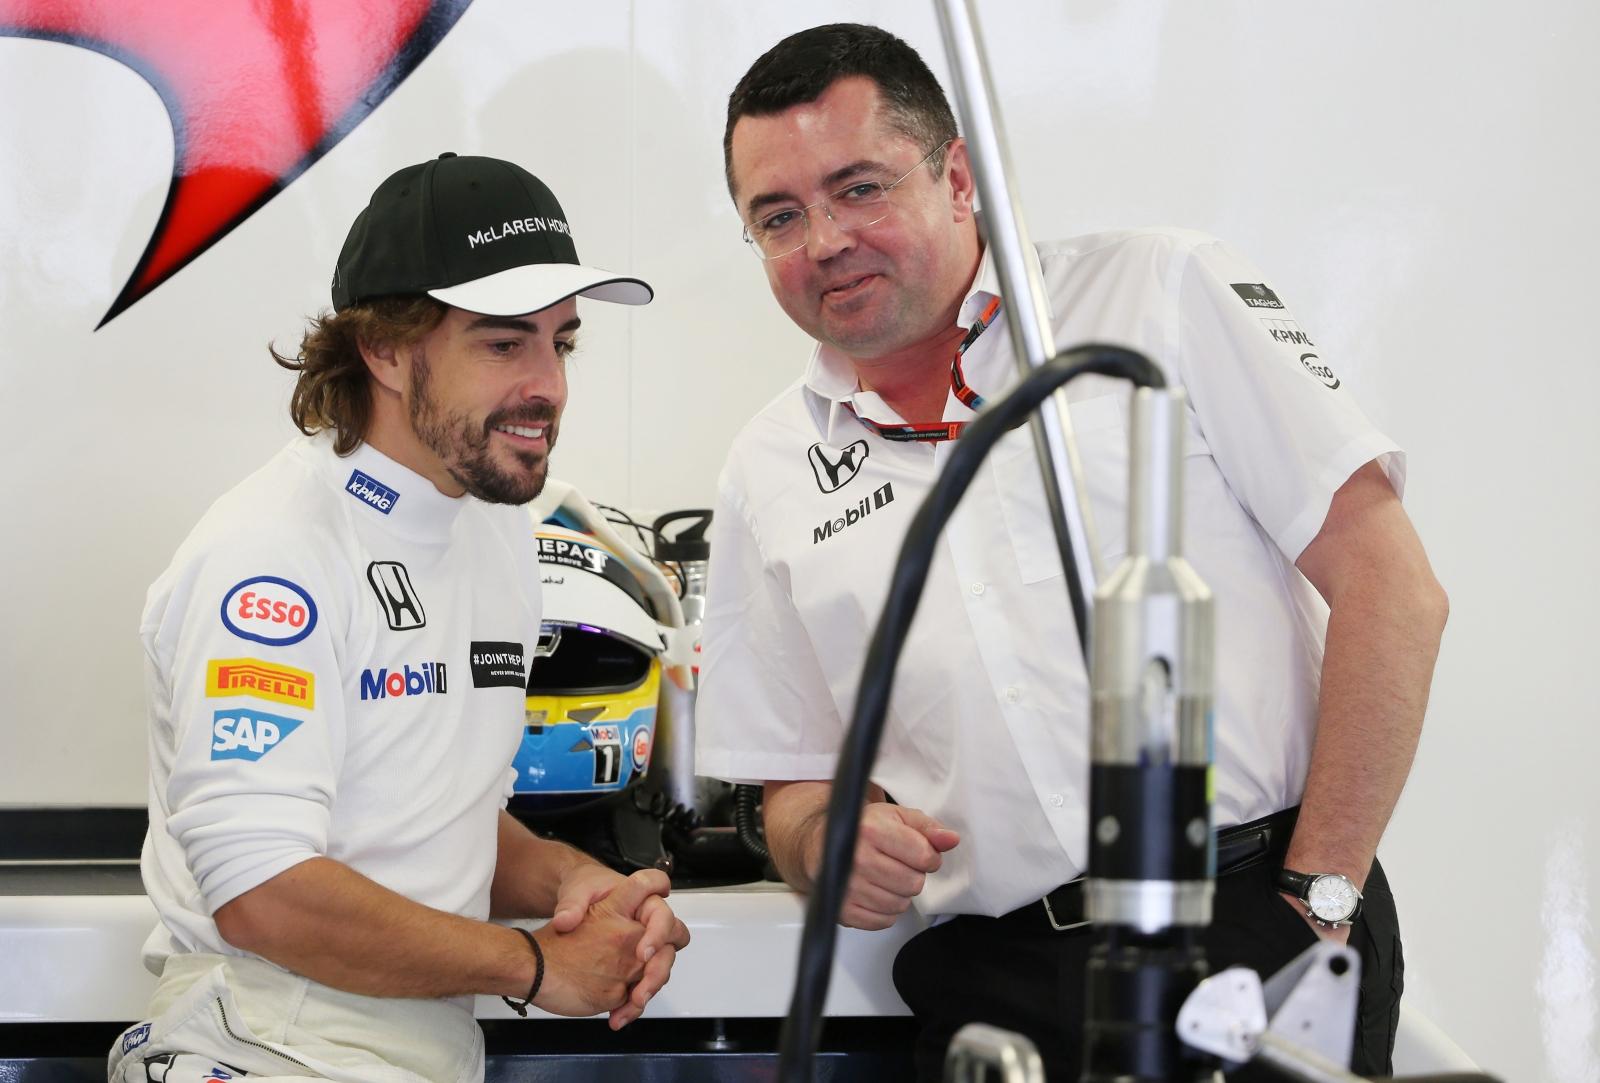 Point-seeking Button replaces Alonso at Monaco Grand Prix